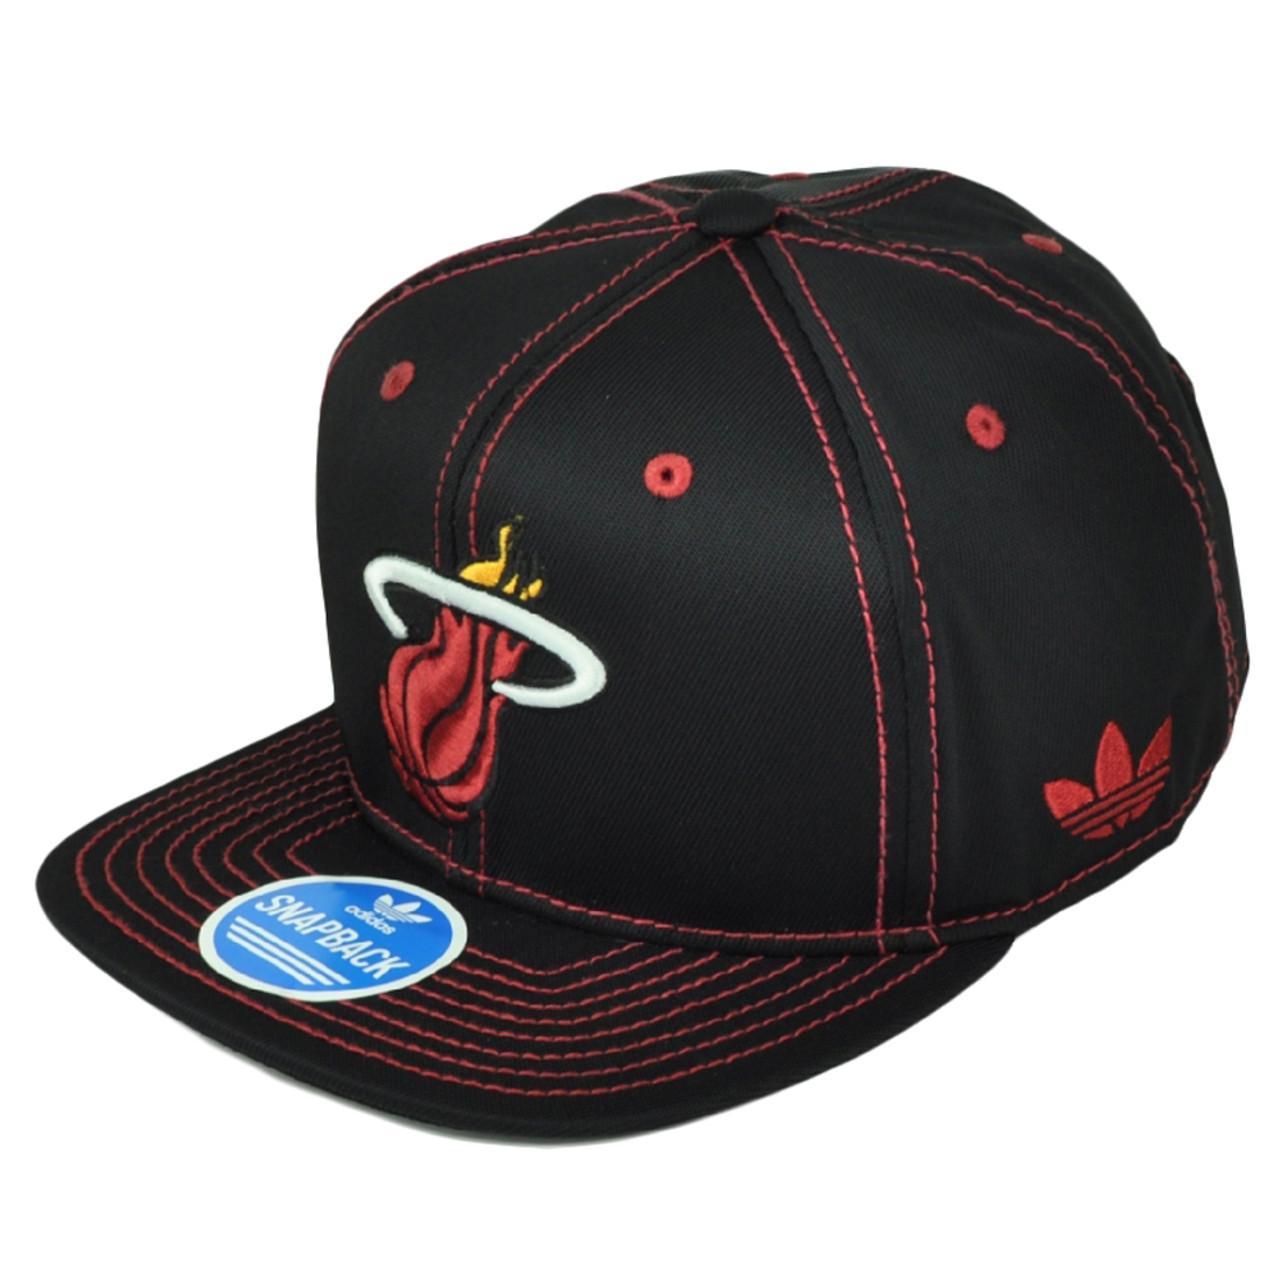 Miami Heat Adidas Black Red Snapback NZG99 Hat Cap Flat Bill Basketball  Nylon 3e5b9becd7be